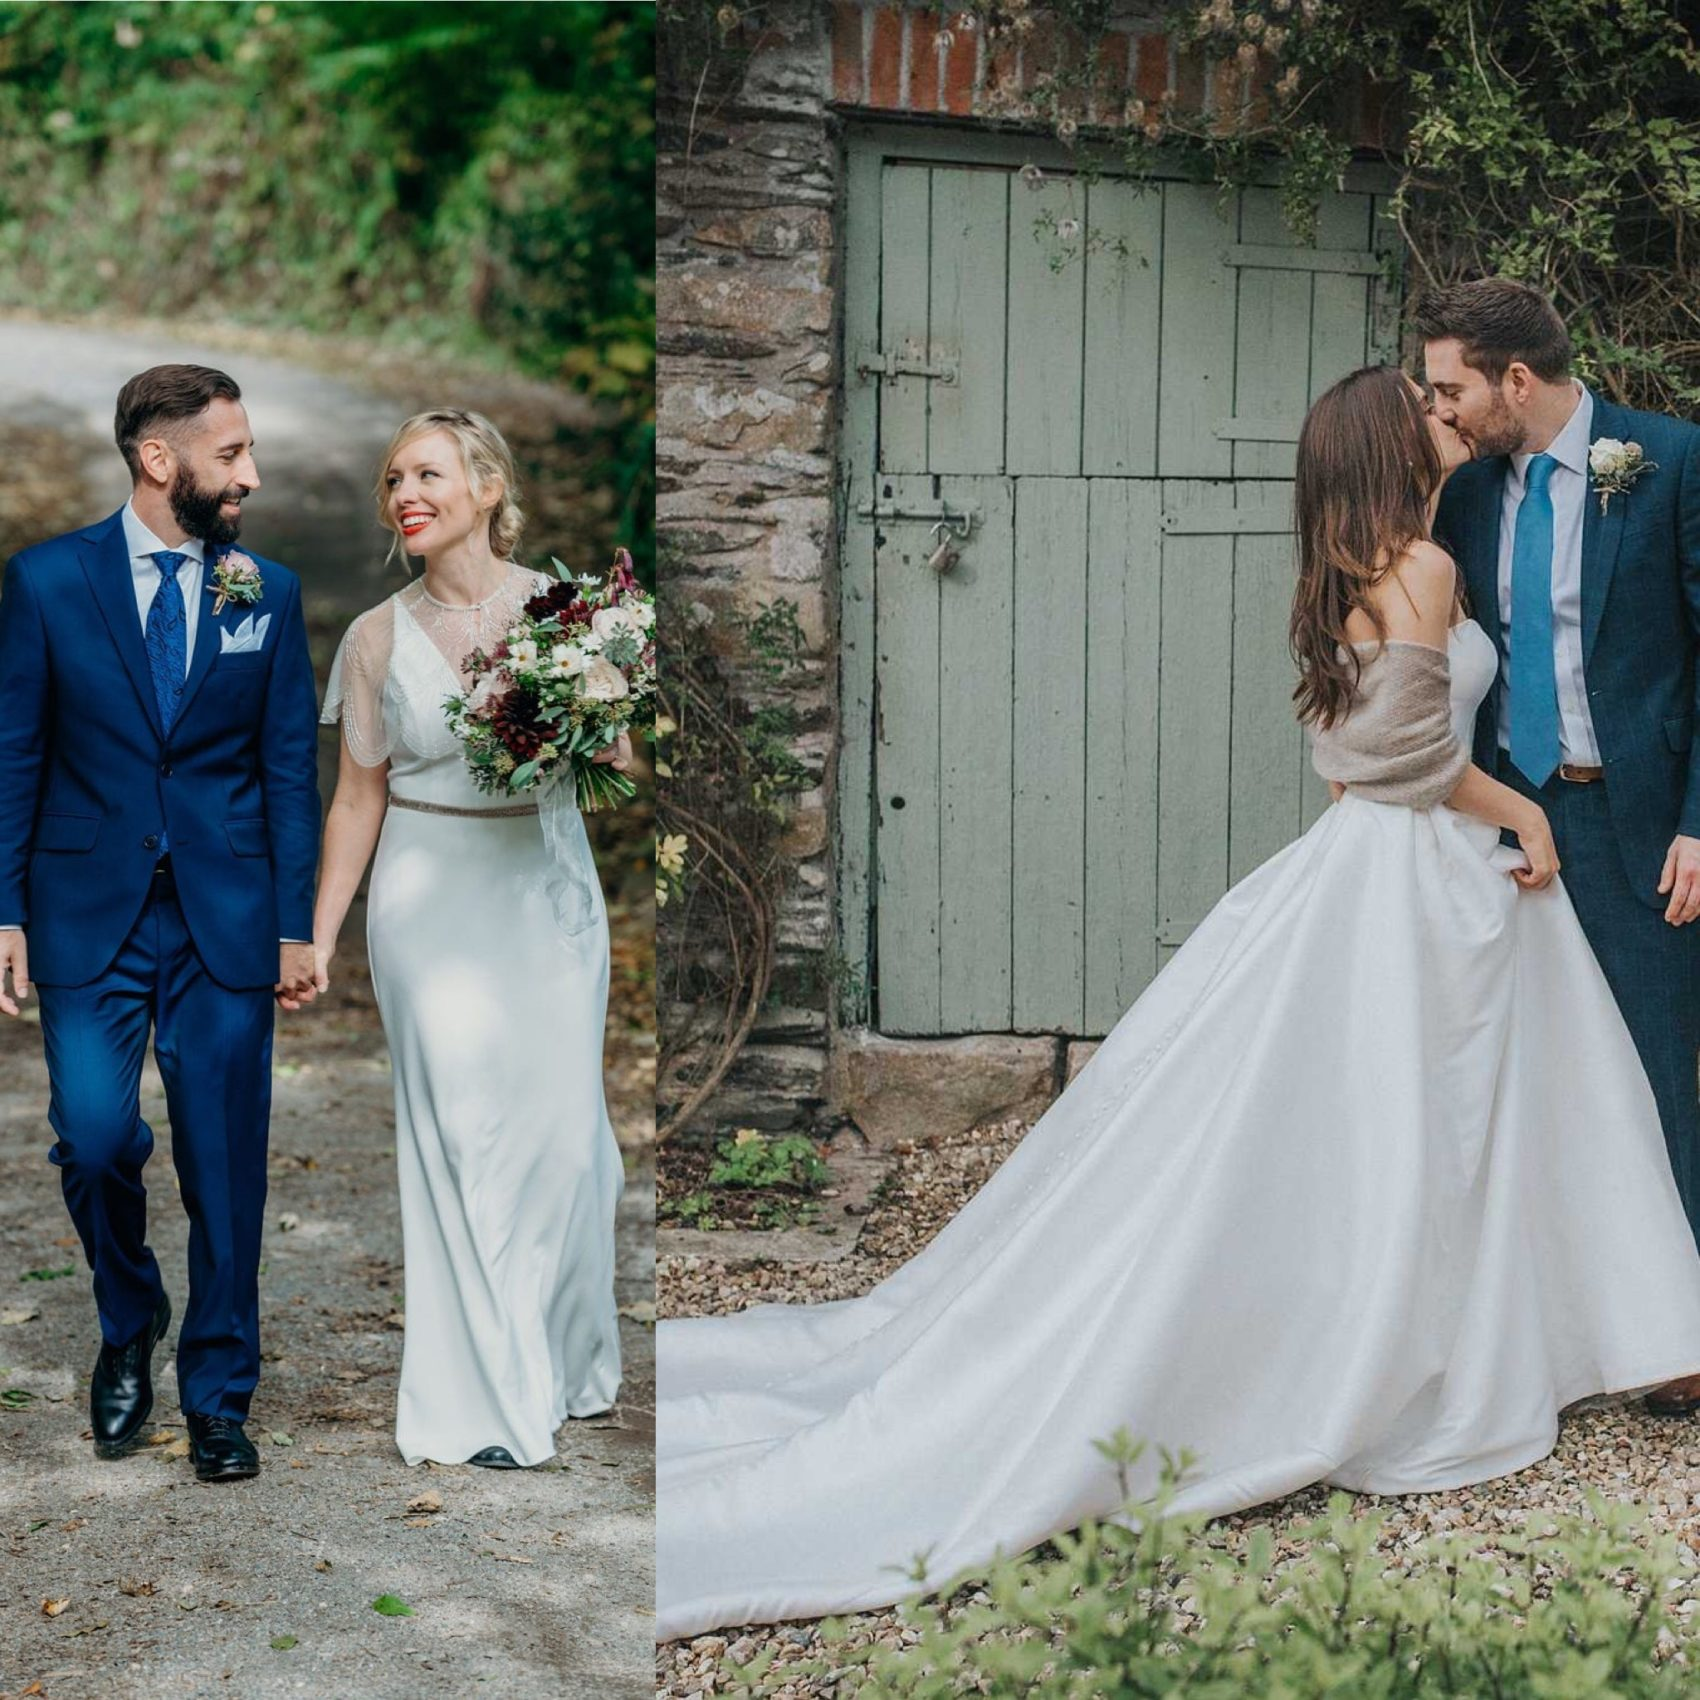 Ever After, Elopement, Wedding, Photographer, Photo, Clare Kinchen, white wedding, woodland wedding, flowers, couple